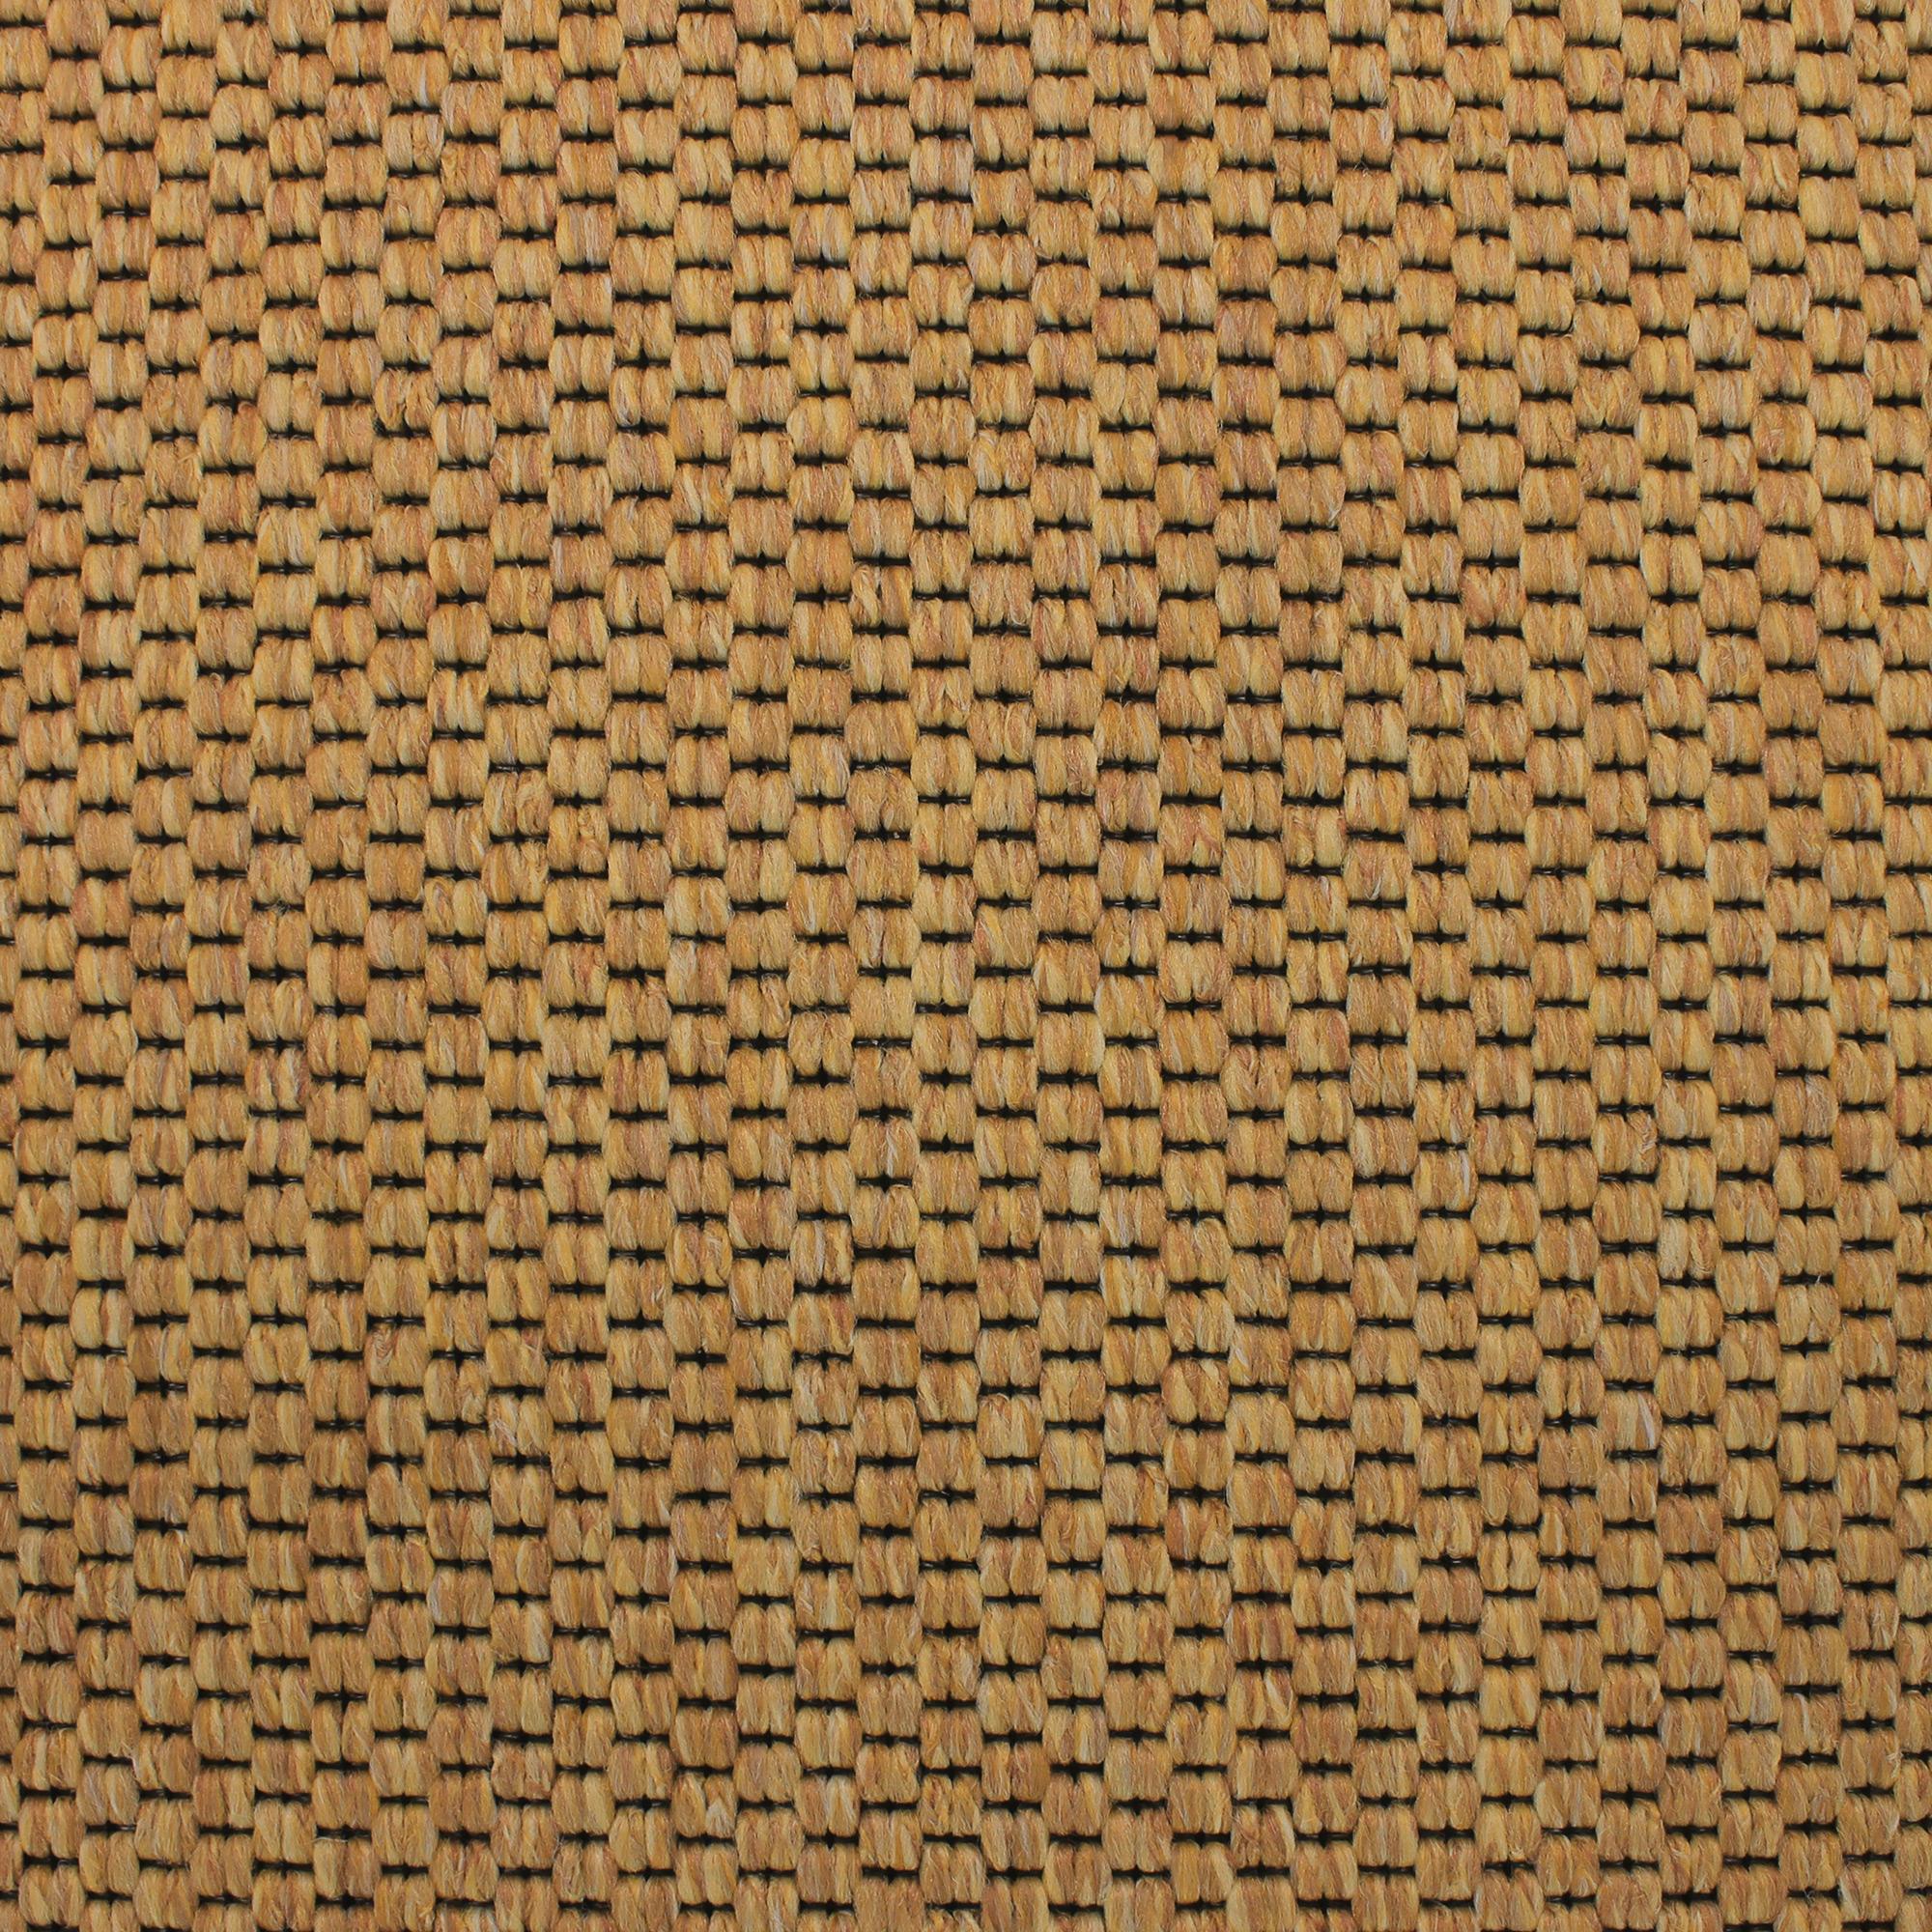 Vloerkleed Casablanca Natura Geweven Honing   170 x 230 cm